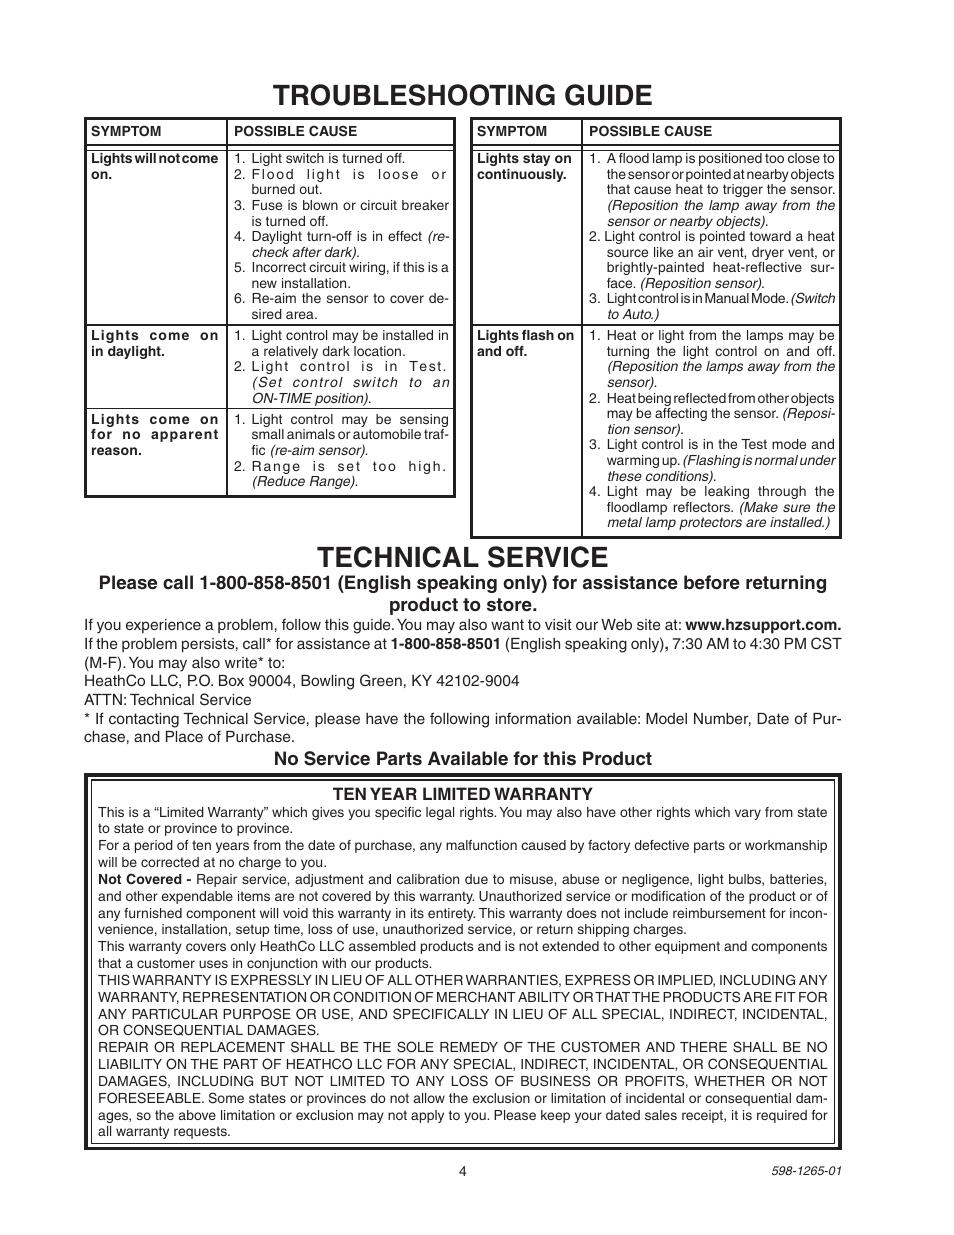 Troubleshooting guide, Technical service   Heath Zenith Motion Sensor Light  Control SL-5412 User